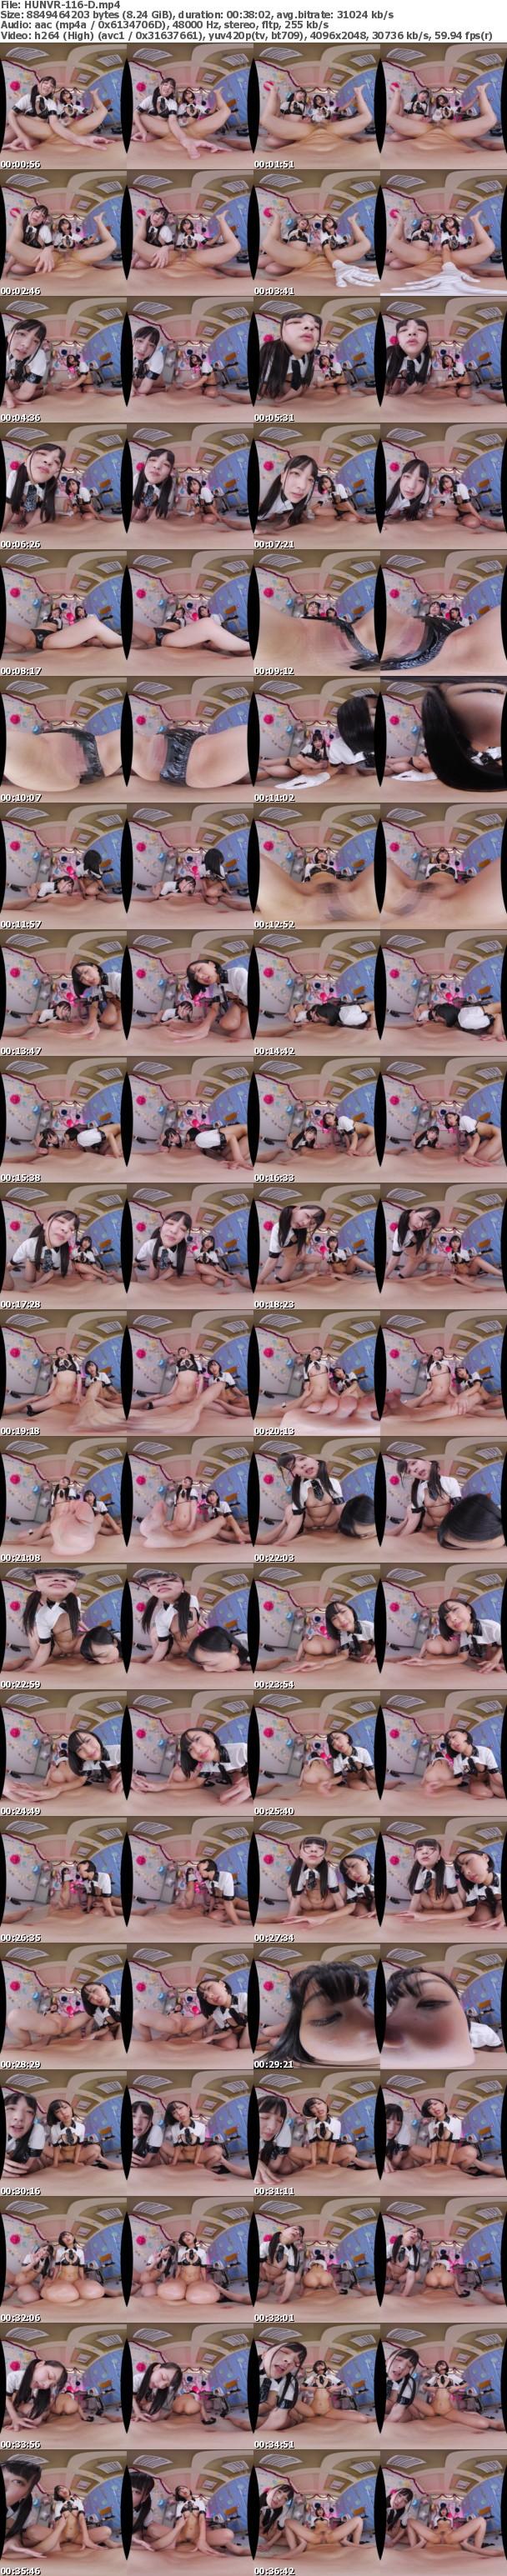 (VR) HUNVR-116 演劇部の文化祭の模擬店はM性感。私立のお嬢様○校の文化祭。ひときわ行列のできる大人気の模擬店は『M性感』だった!普段は真面目なお嬢様たちが目隠し、寸止め、アナル責めにお下品言葉責めで調教してくださいます!